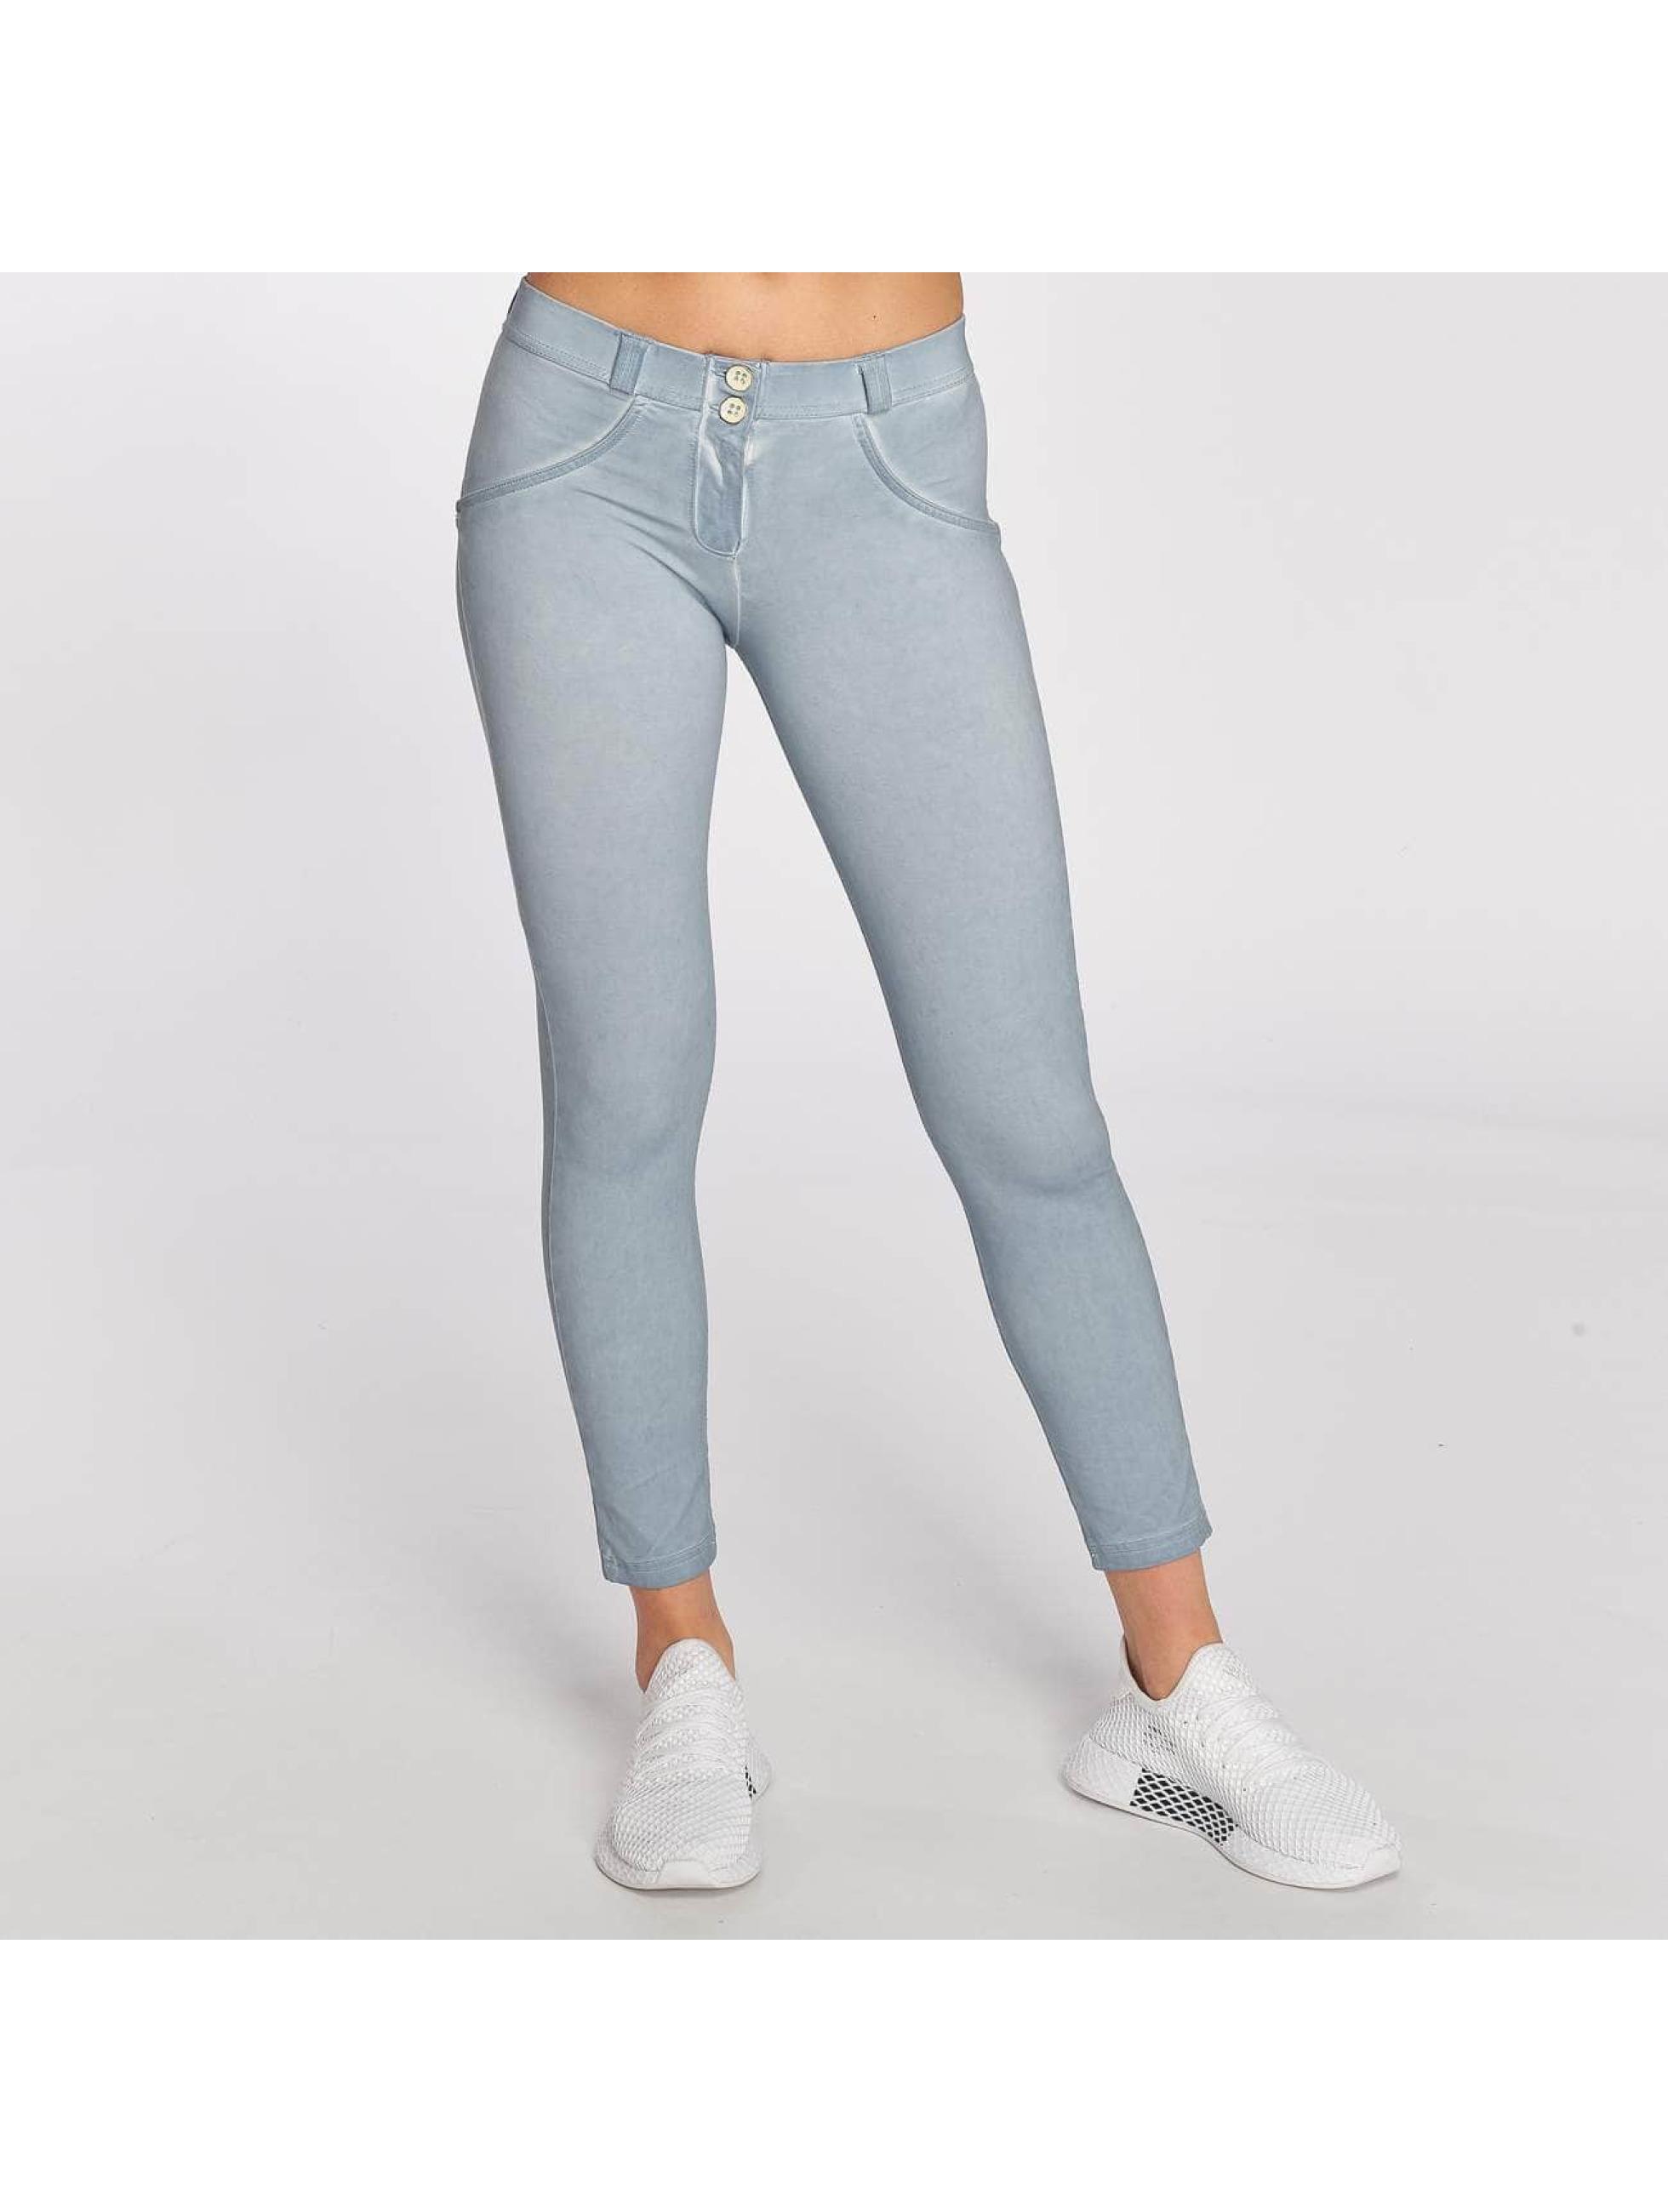 Freddy Skinny Jeans Pantalone 7/8 blå